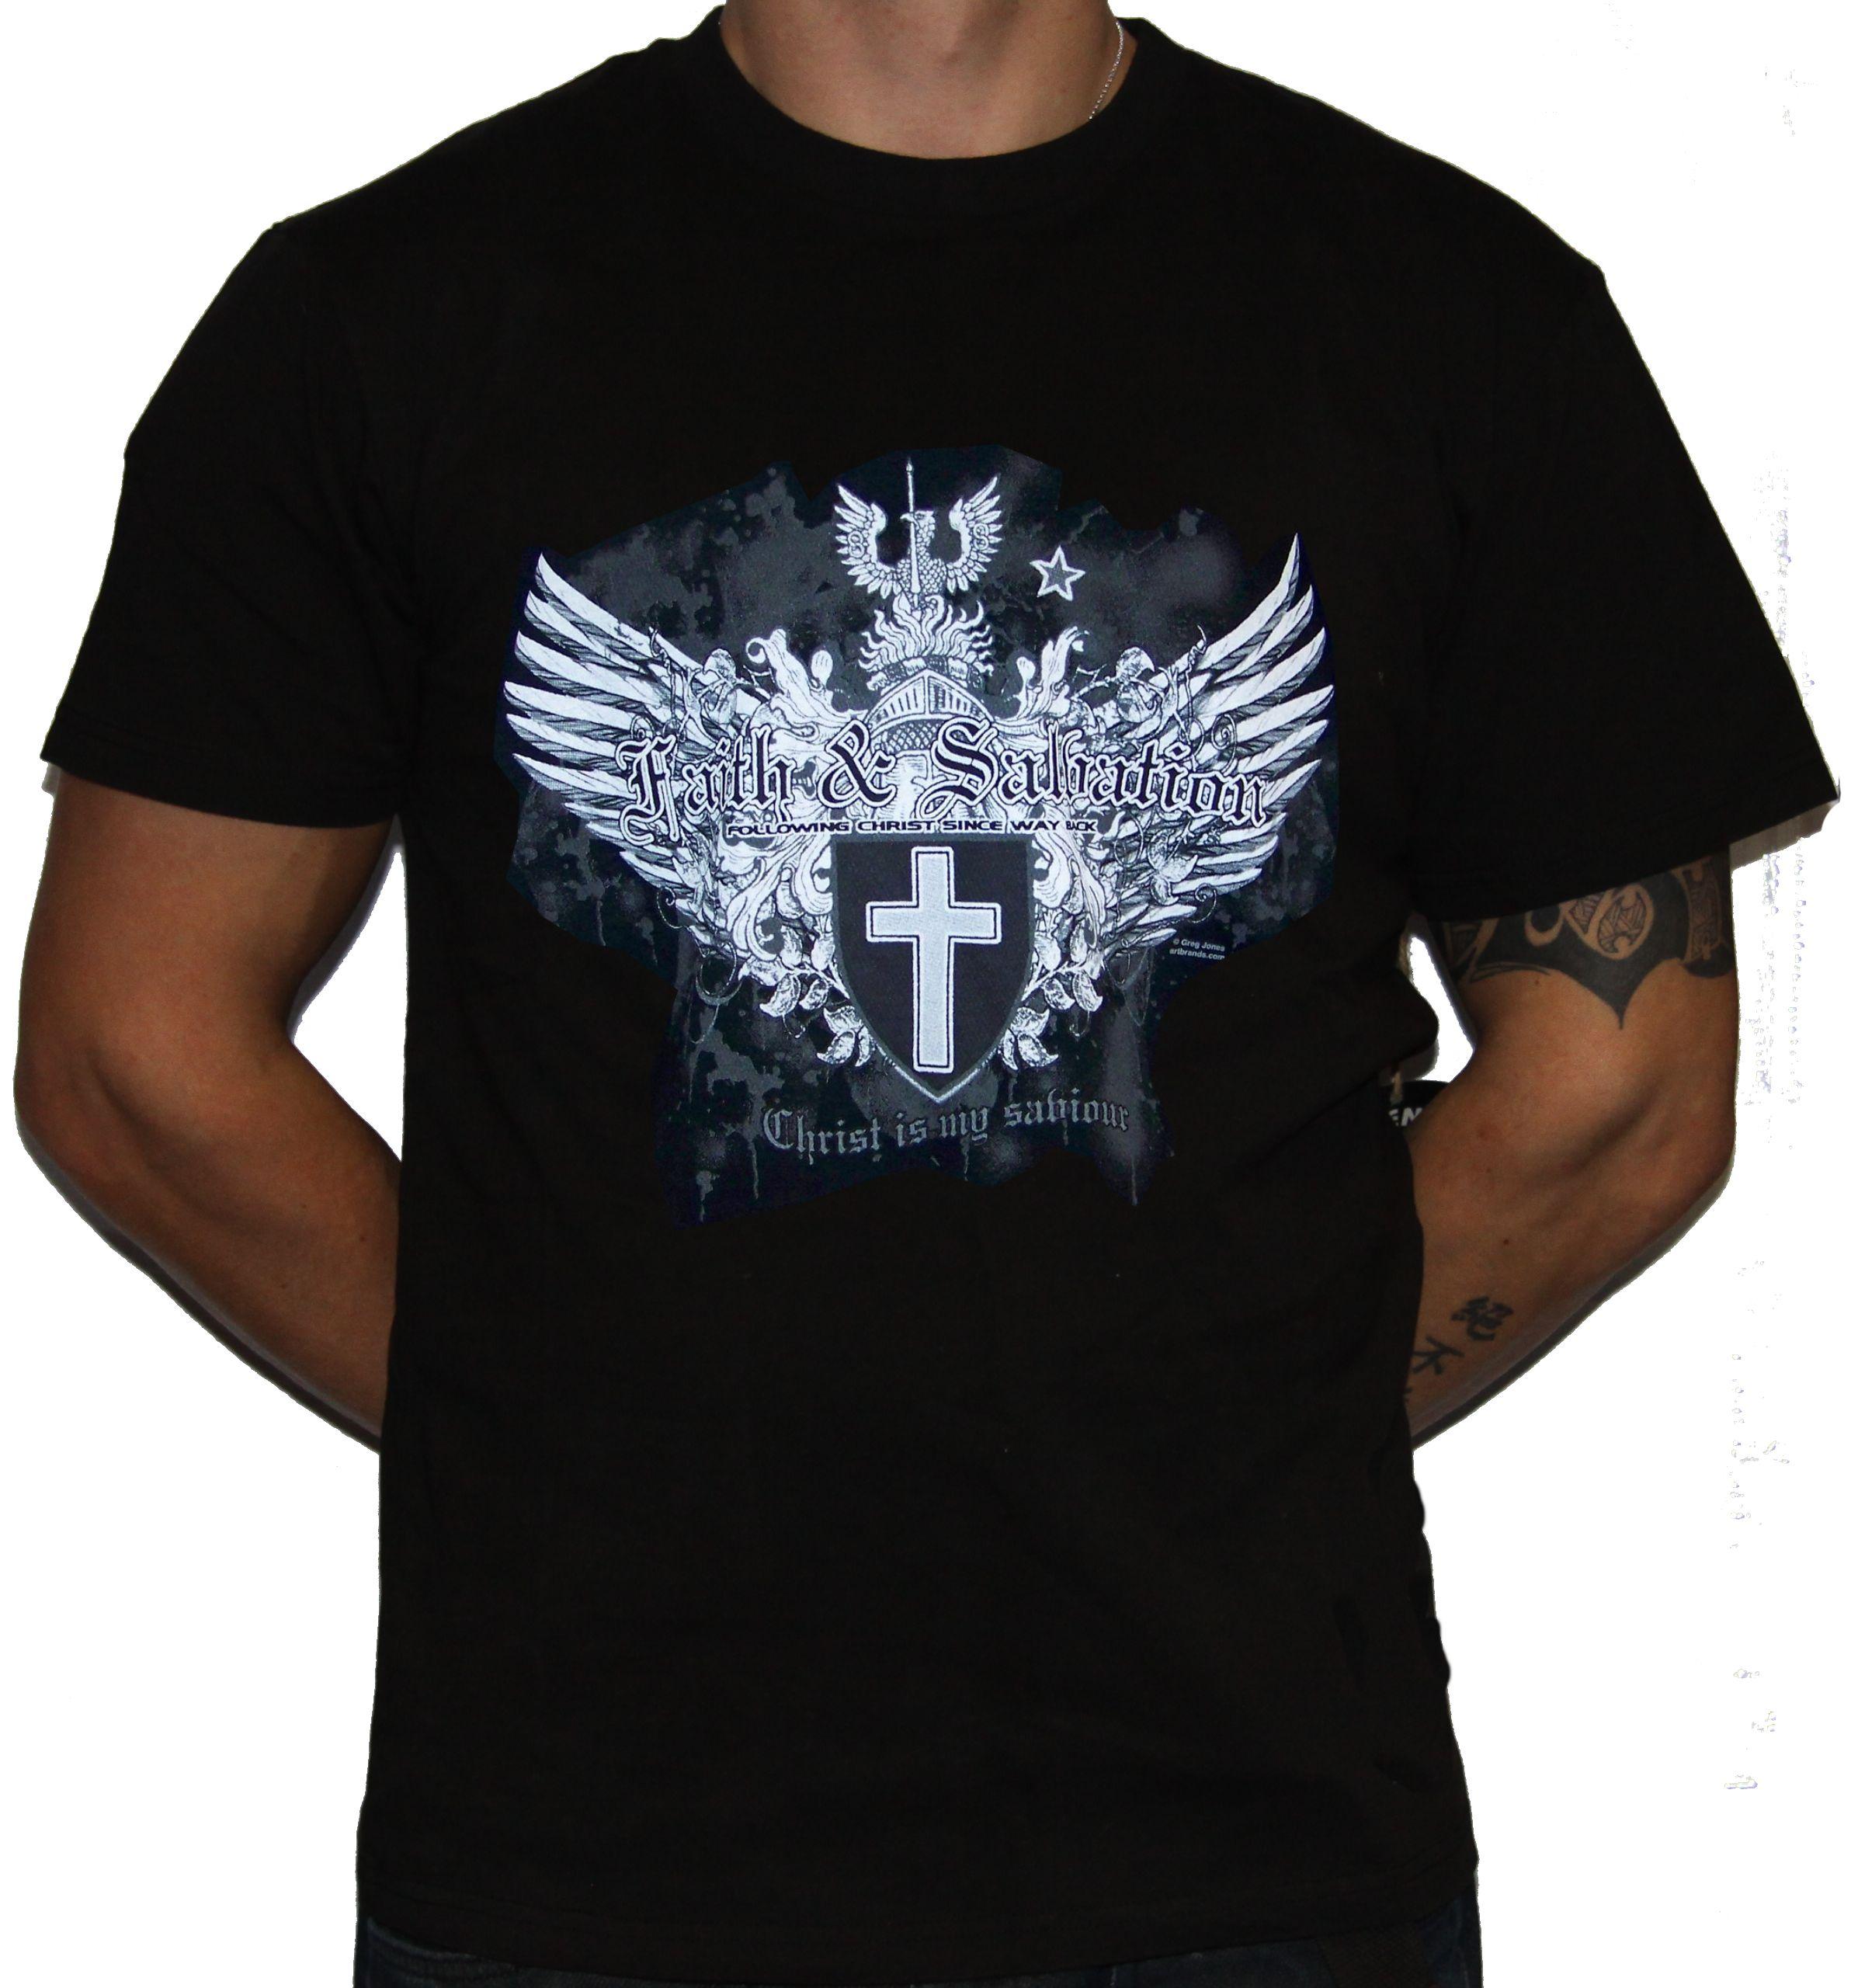 Storenvy coupon: Spiritual - Christ is My Salvation Black T-Shirt